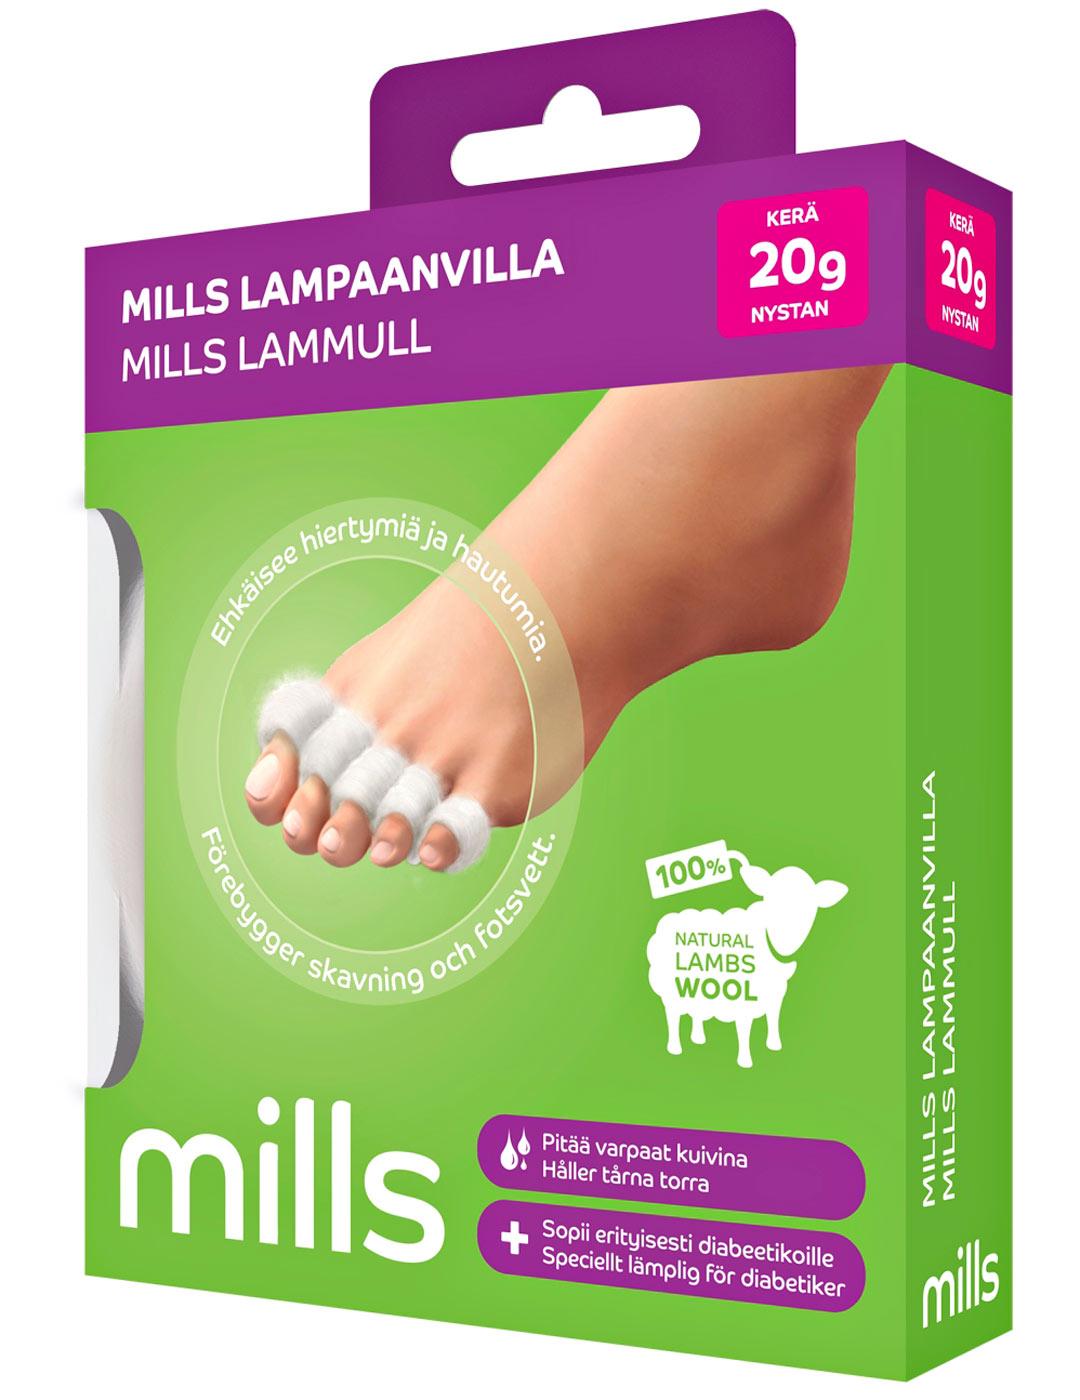 Mills Lampaanvilla